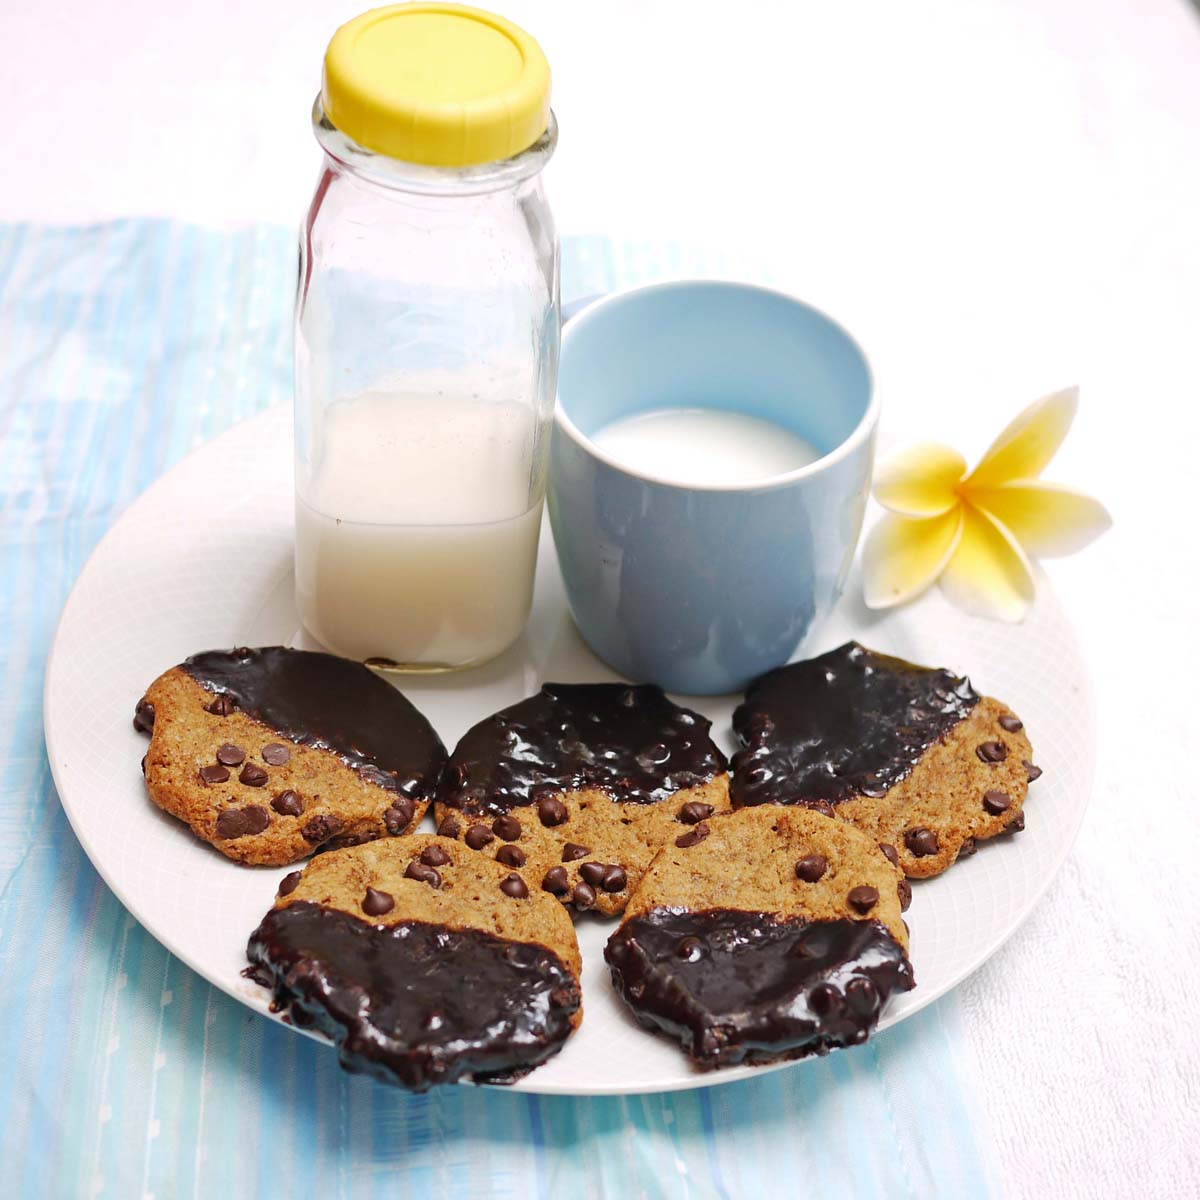 P1090109 chocolate ganache dipped chocolate chip cookies 66